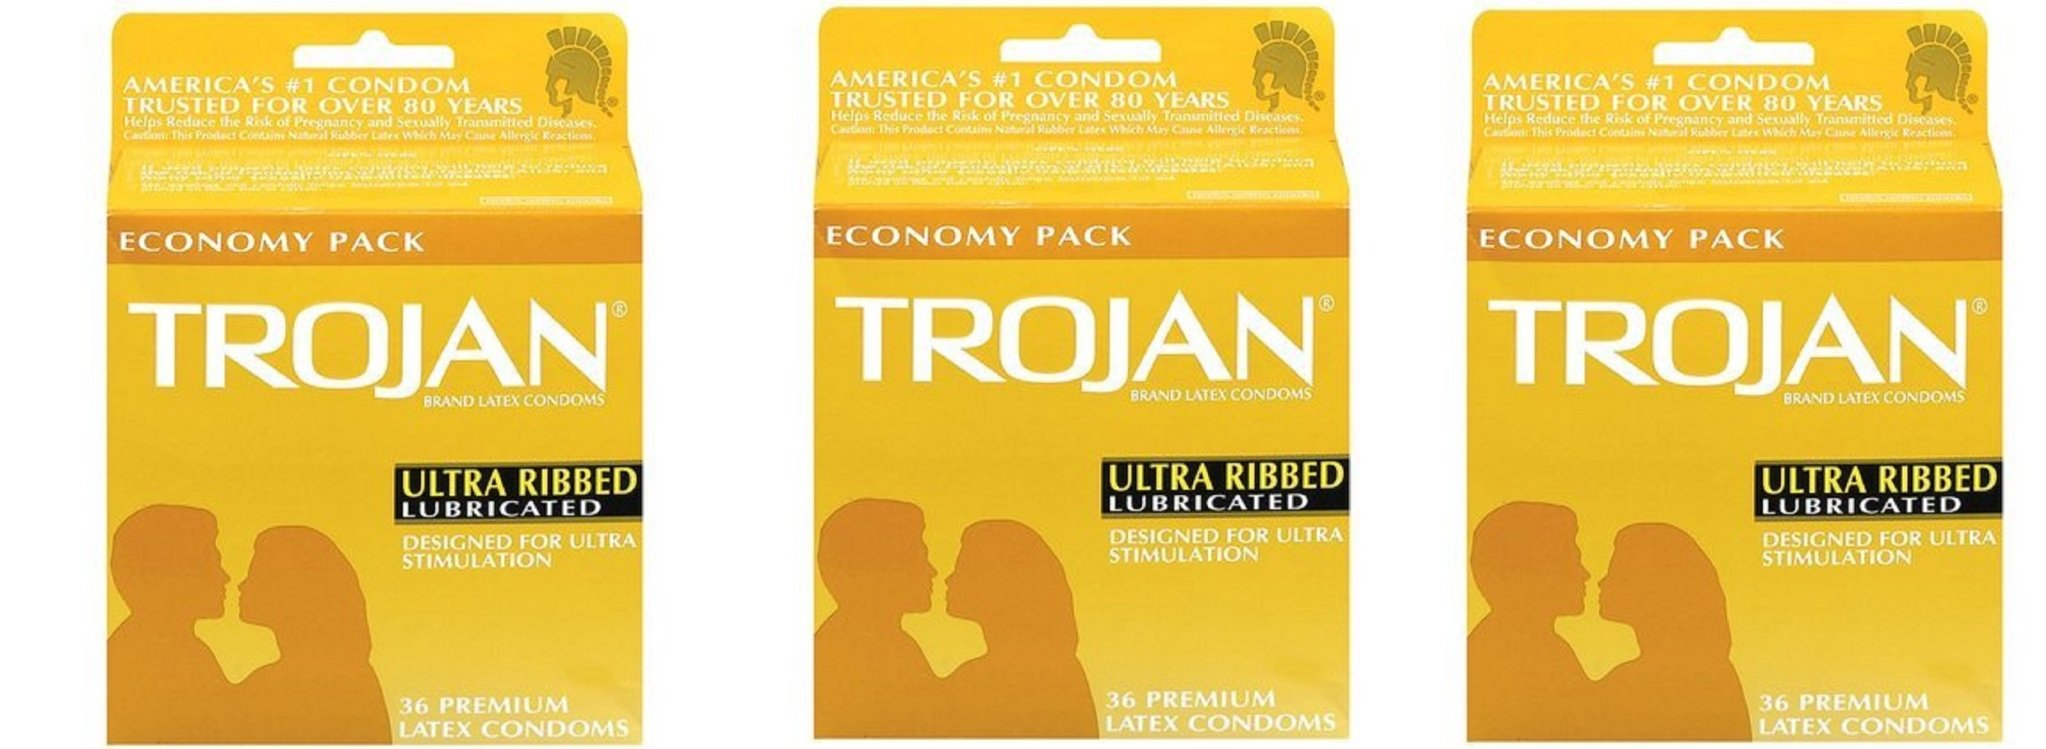 Trojan Ultra Ribbed, Economy Pack kjkPpA, 36Pack (36 ea) by Trojan